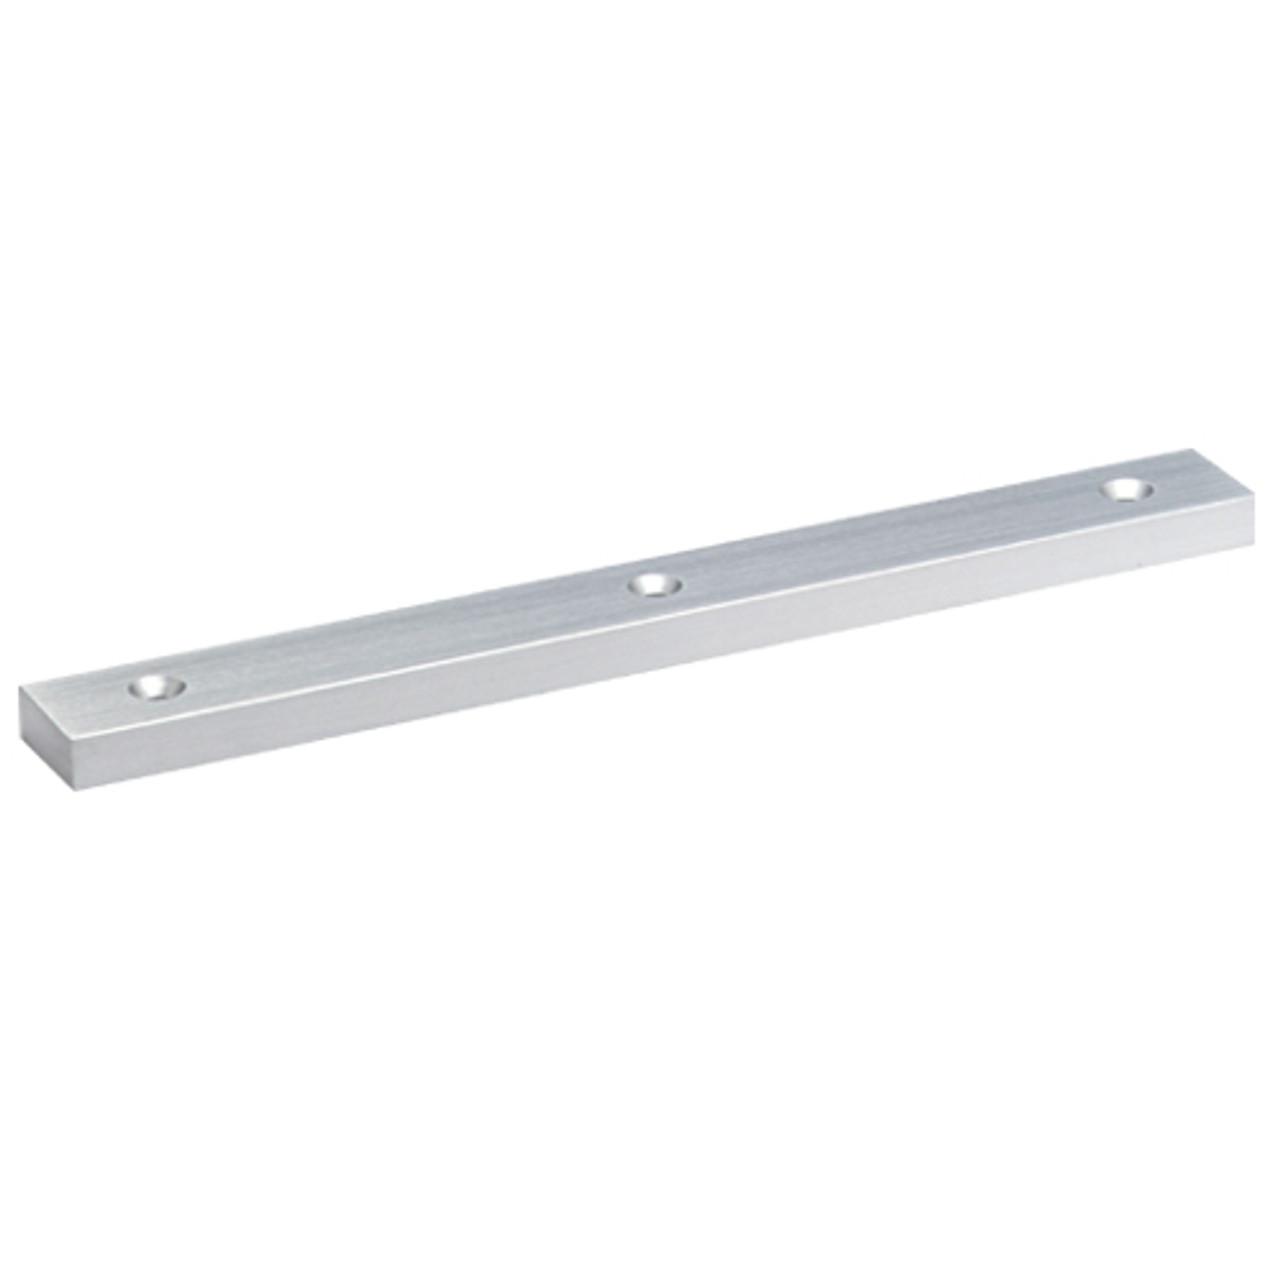 4415-US26 DynaLock 4000 Series Filler Plates for Single Maglocks in Bright Chrome